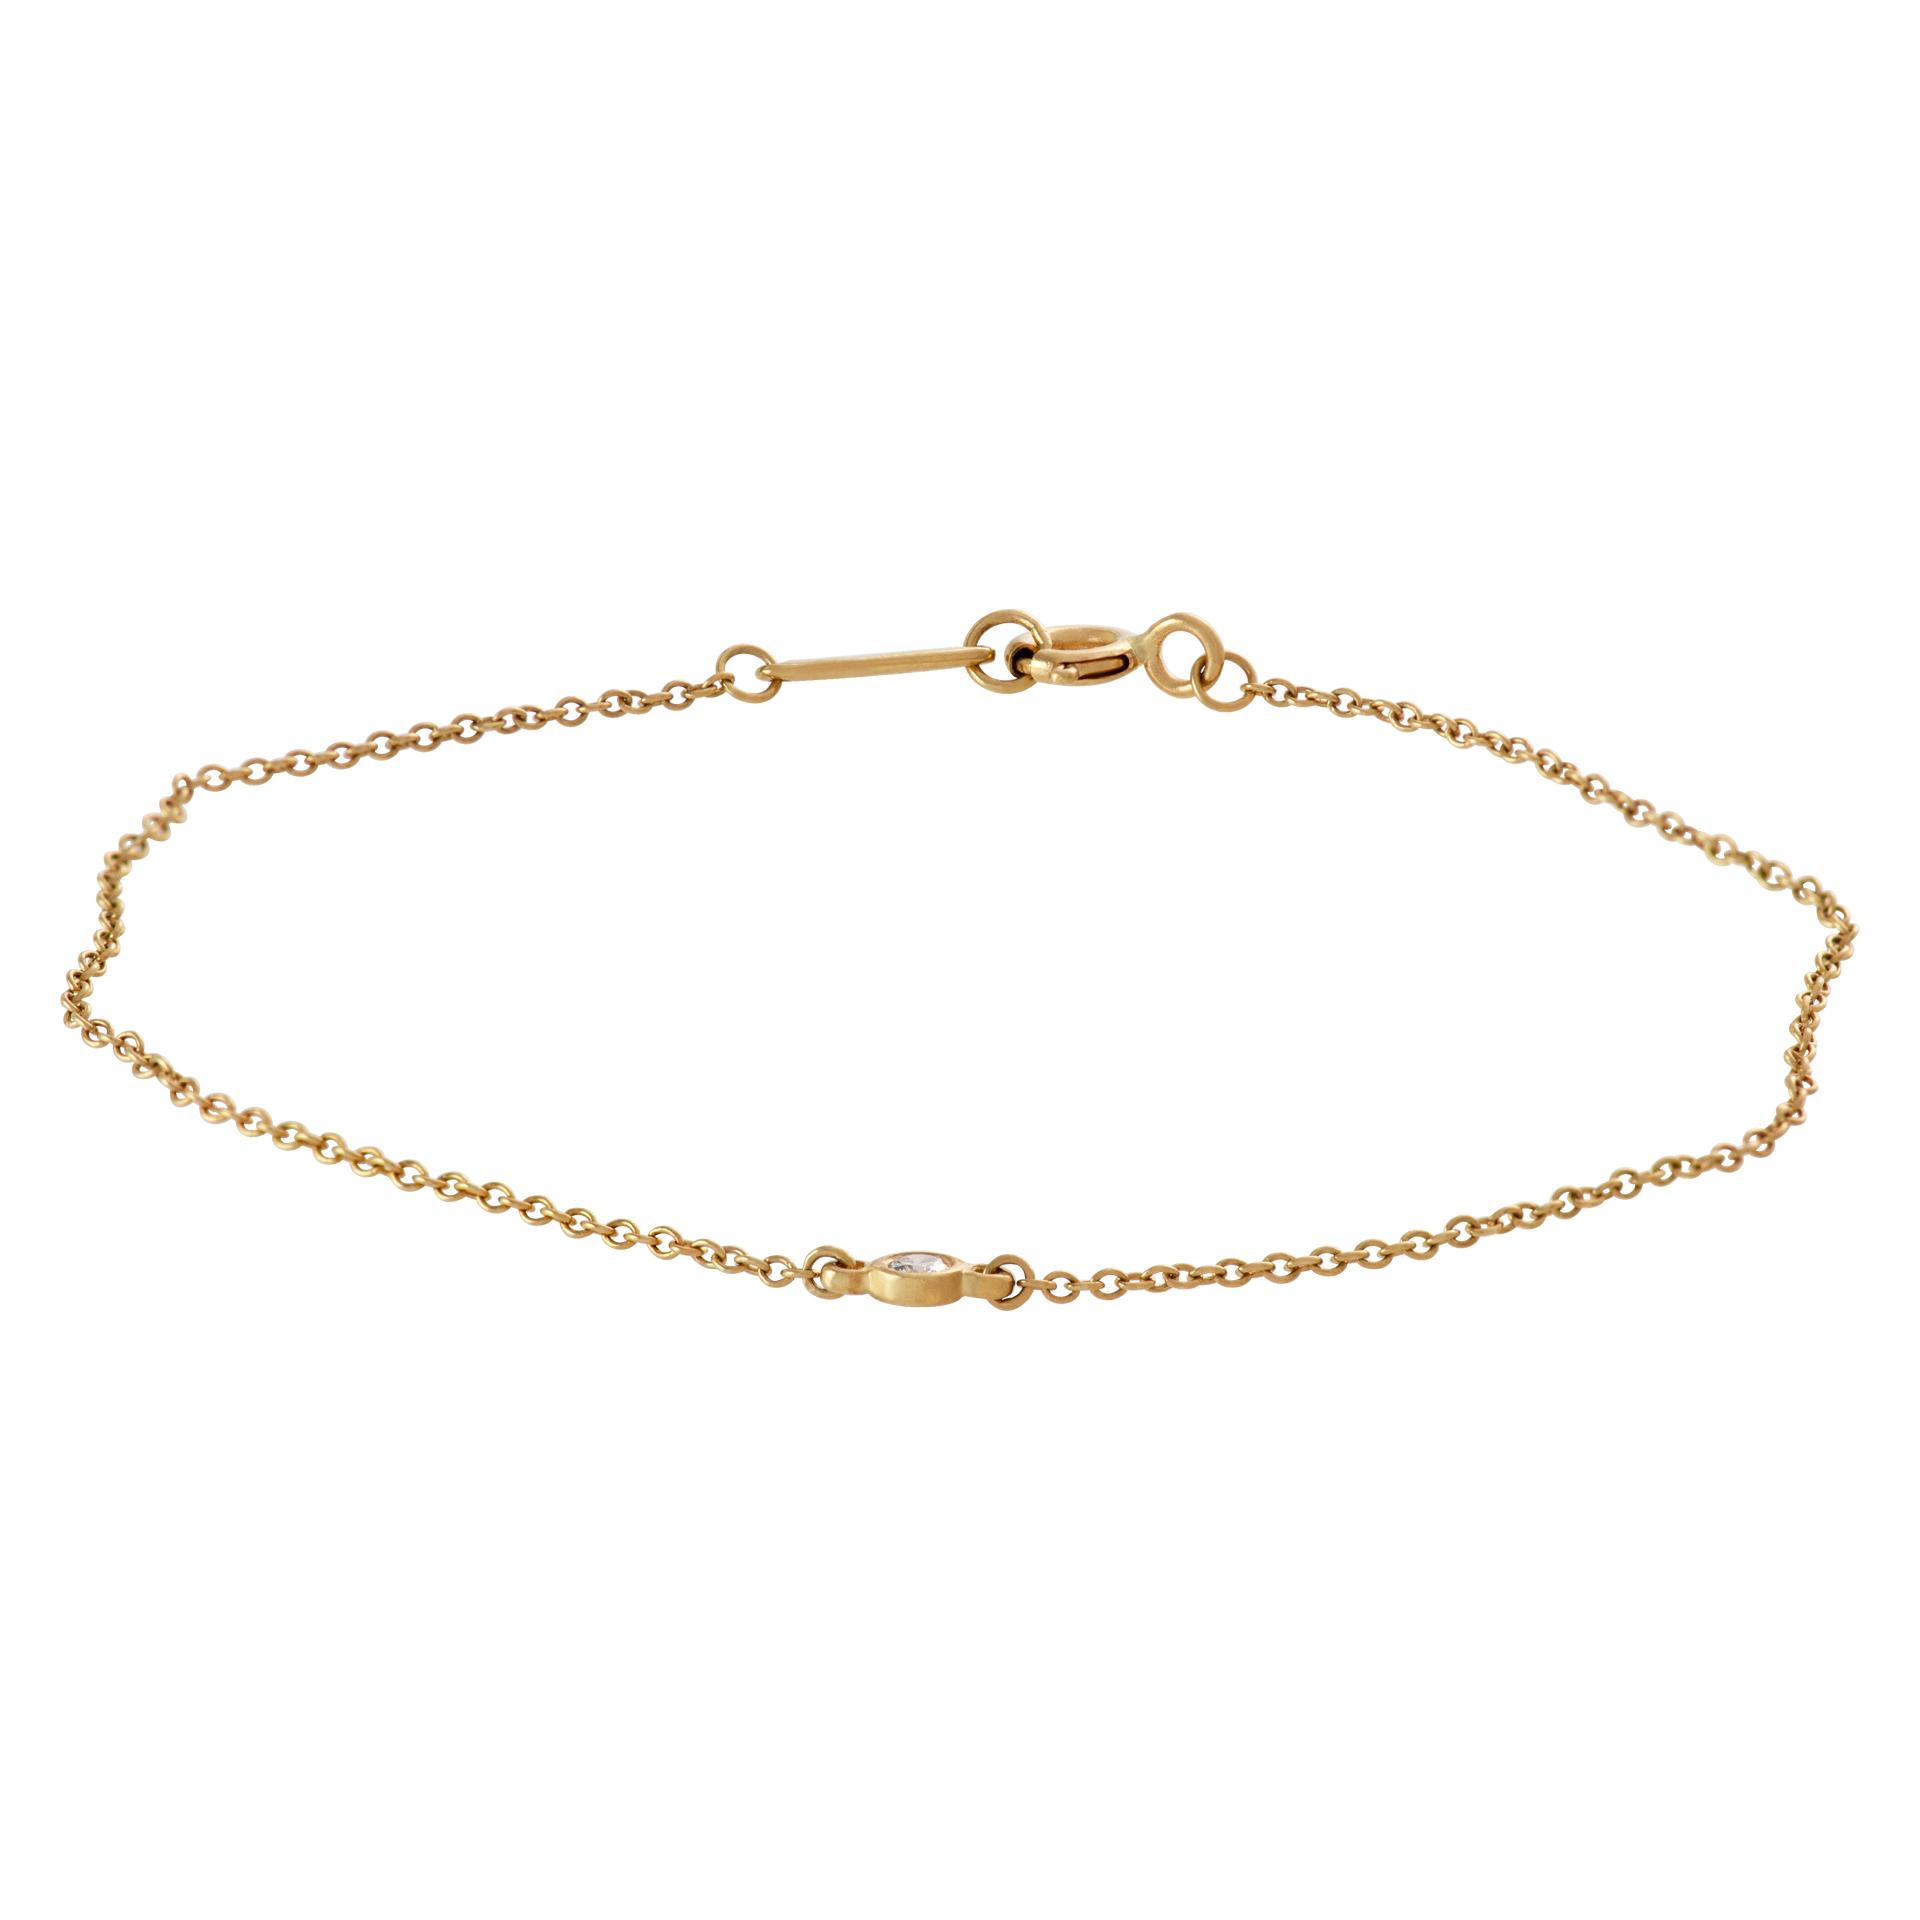 Tiffany & Co. 'Elsa Peretti' Diamond by the yard bracelet in 18k yellow gold